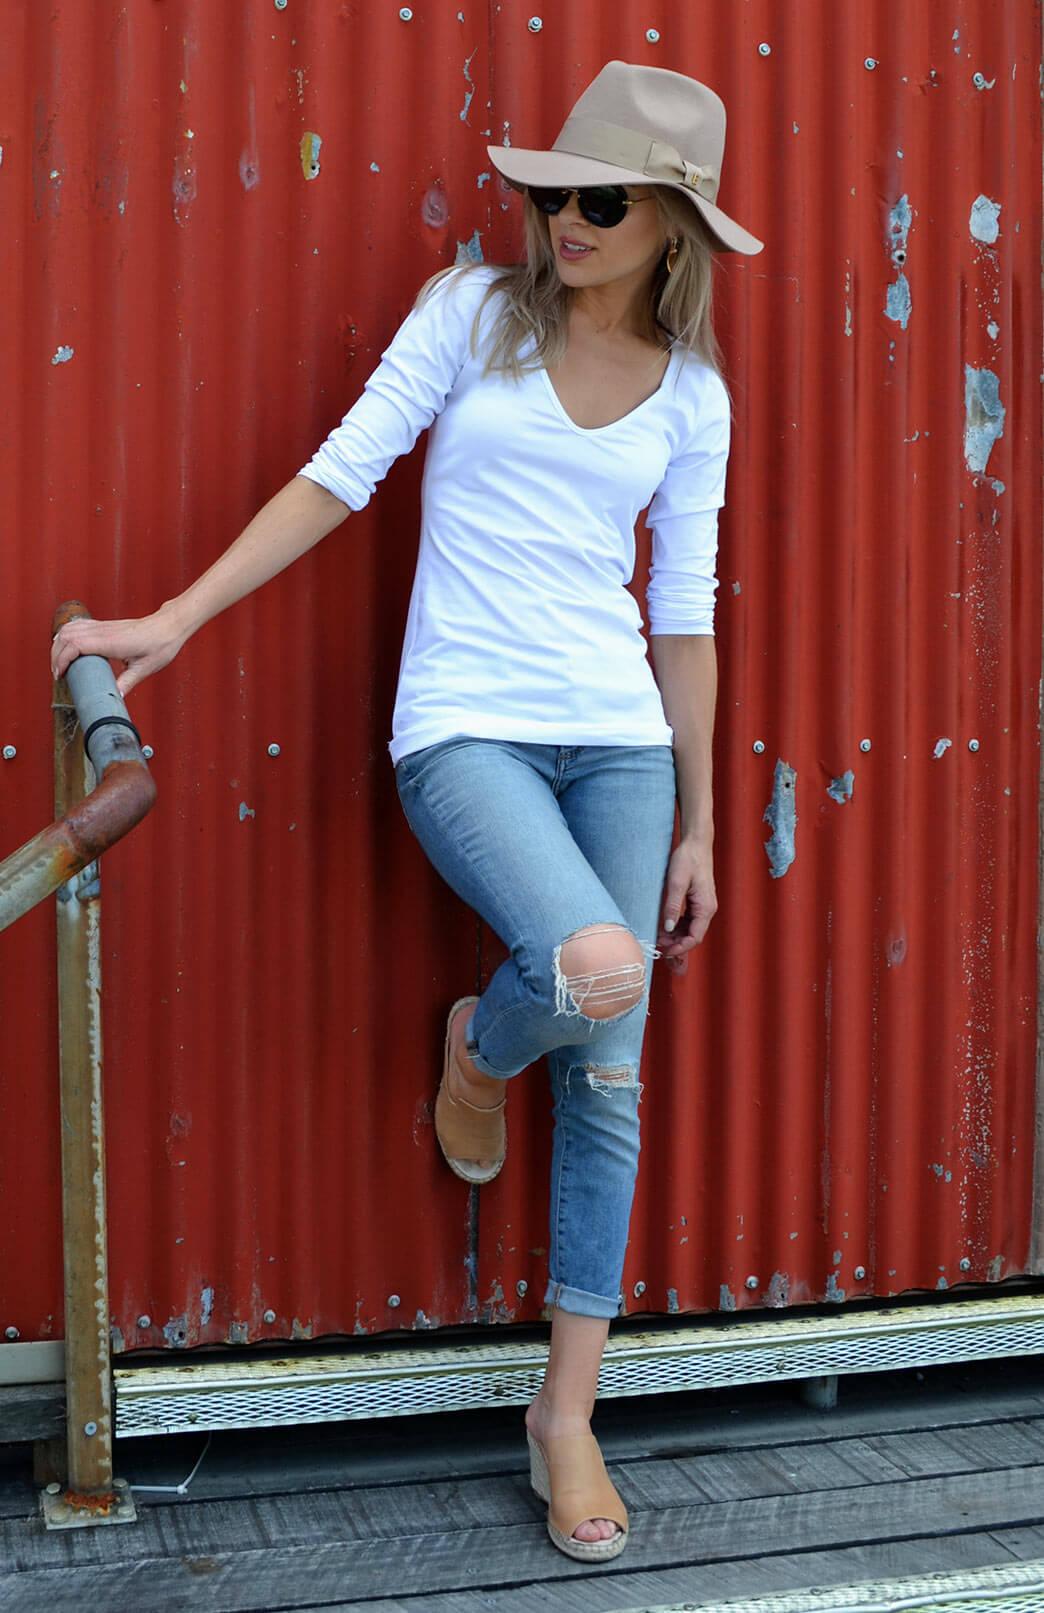 V-Neck Top (Organic Cotton) - Women's White Organic Cotton V-Neck Top with Long Sleeves - Smitten Merino Tasmania Australia